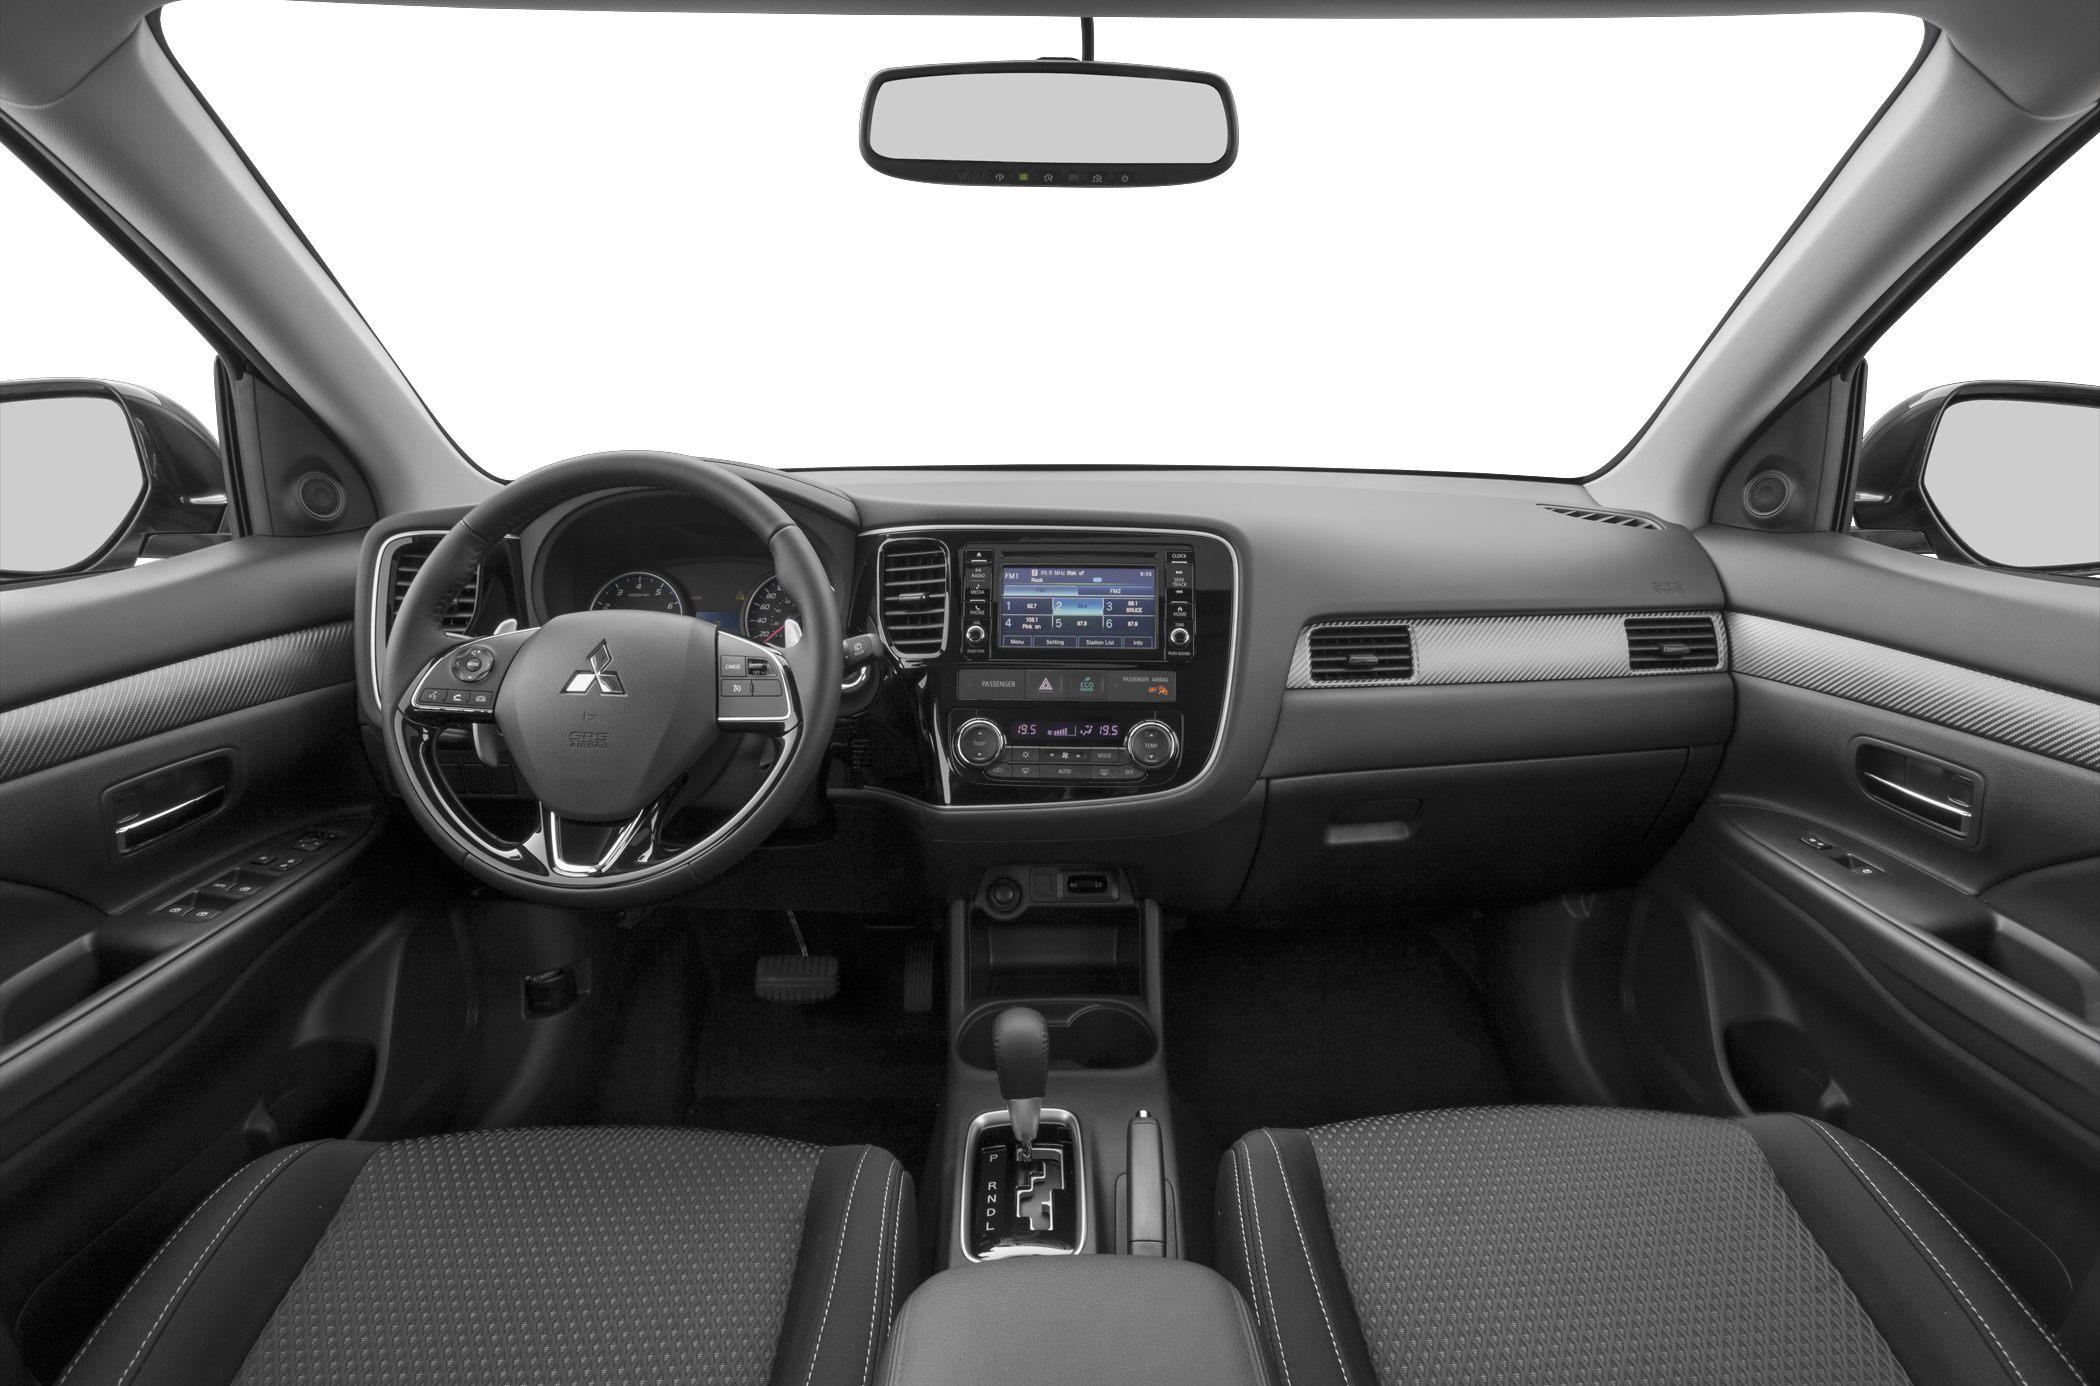 2017 Mitsubishi Outlander Reviews, Specs and Prices | Cars.com